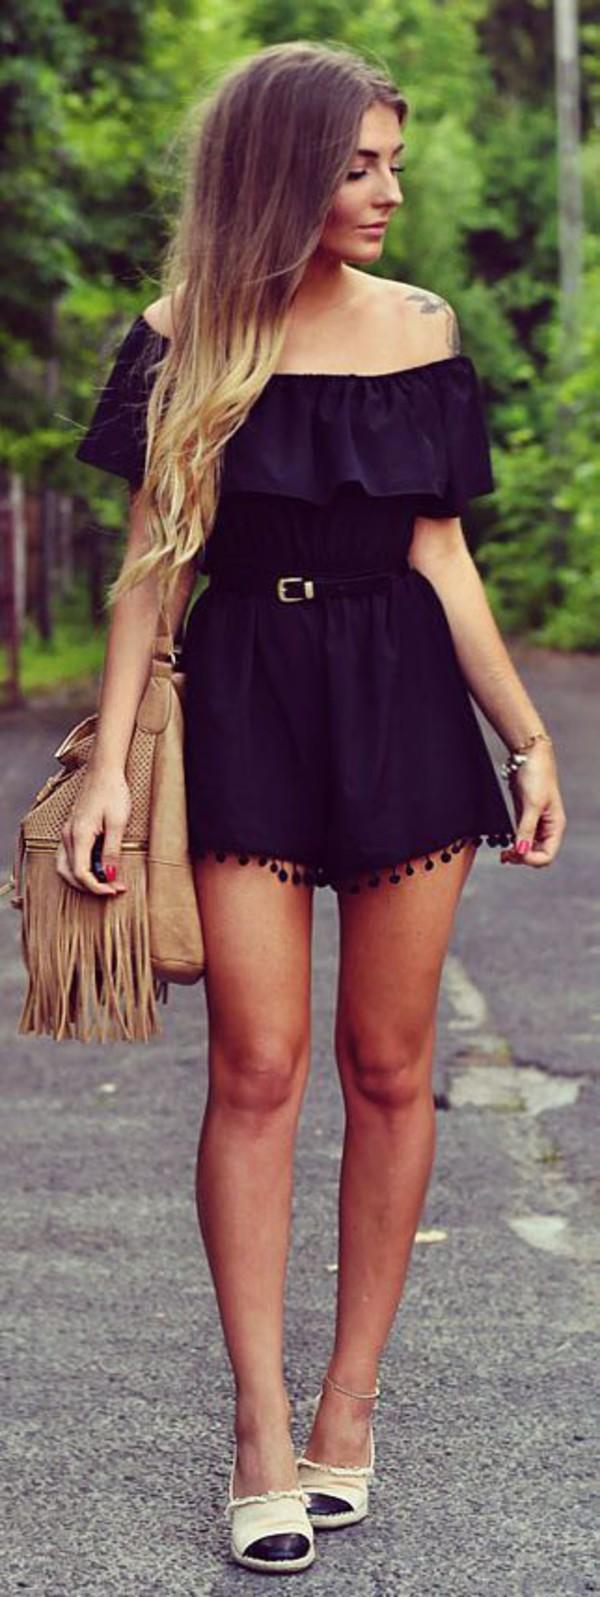 Jumpsuit black picture from we heart it weheartit romper belt boho dress off the shoulder wheretoget